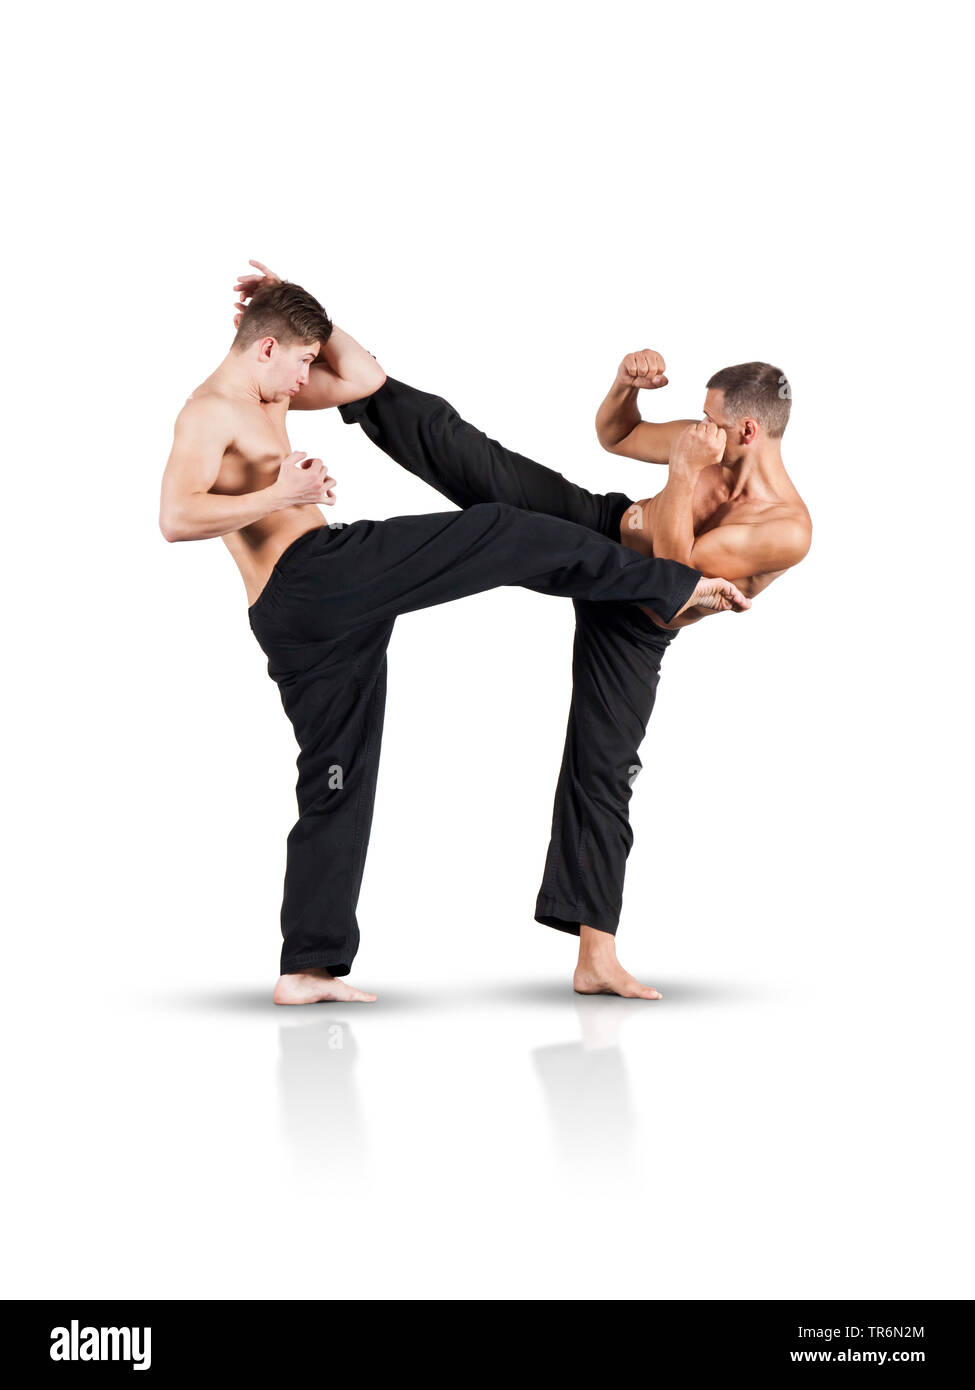 zwei Maenner beim Kickboxen, Deutschland | two man kickboxing, Germany | BLWS487483.jpg [ (c) blickwinkel/McPHOTO/M. Gann Tel. +49 (0)2302-2793220, E- - Stock Image